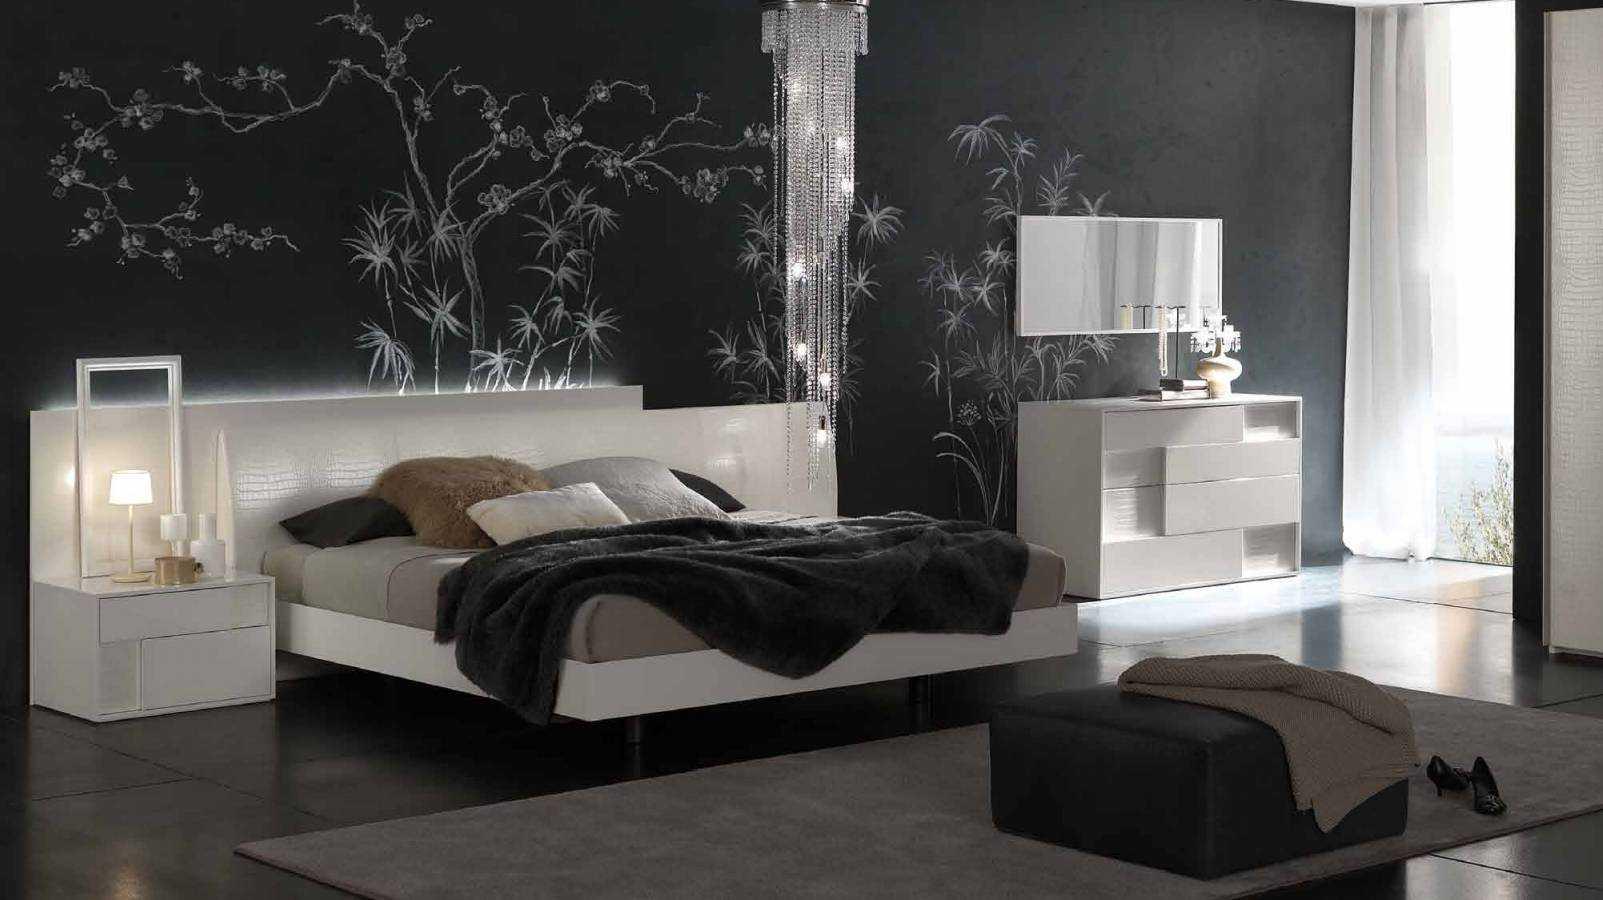 dizain spalni 4 - Идеи для ремонта спальни своими руками